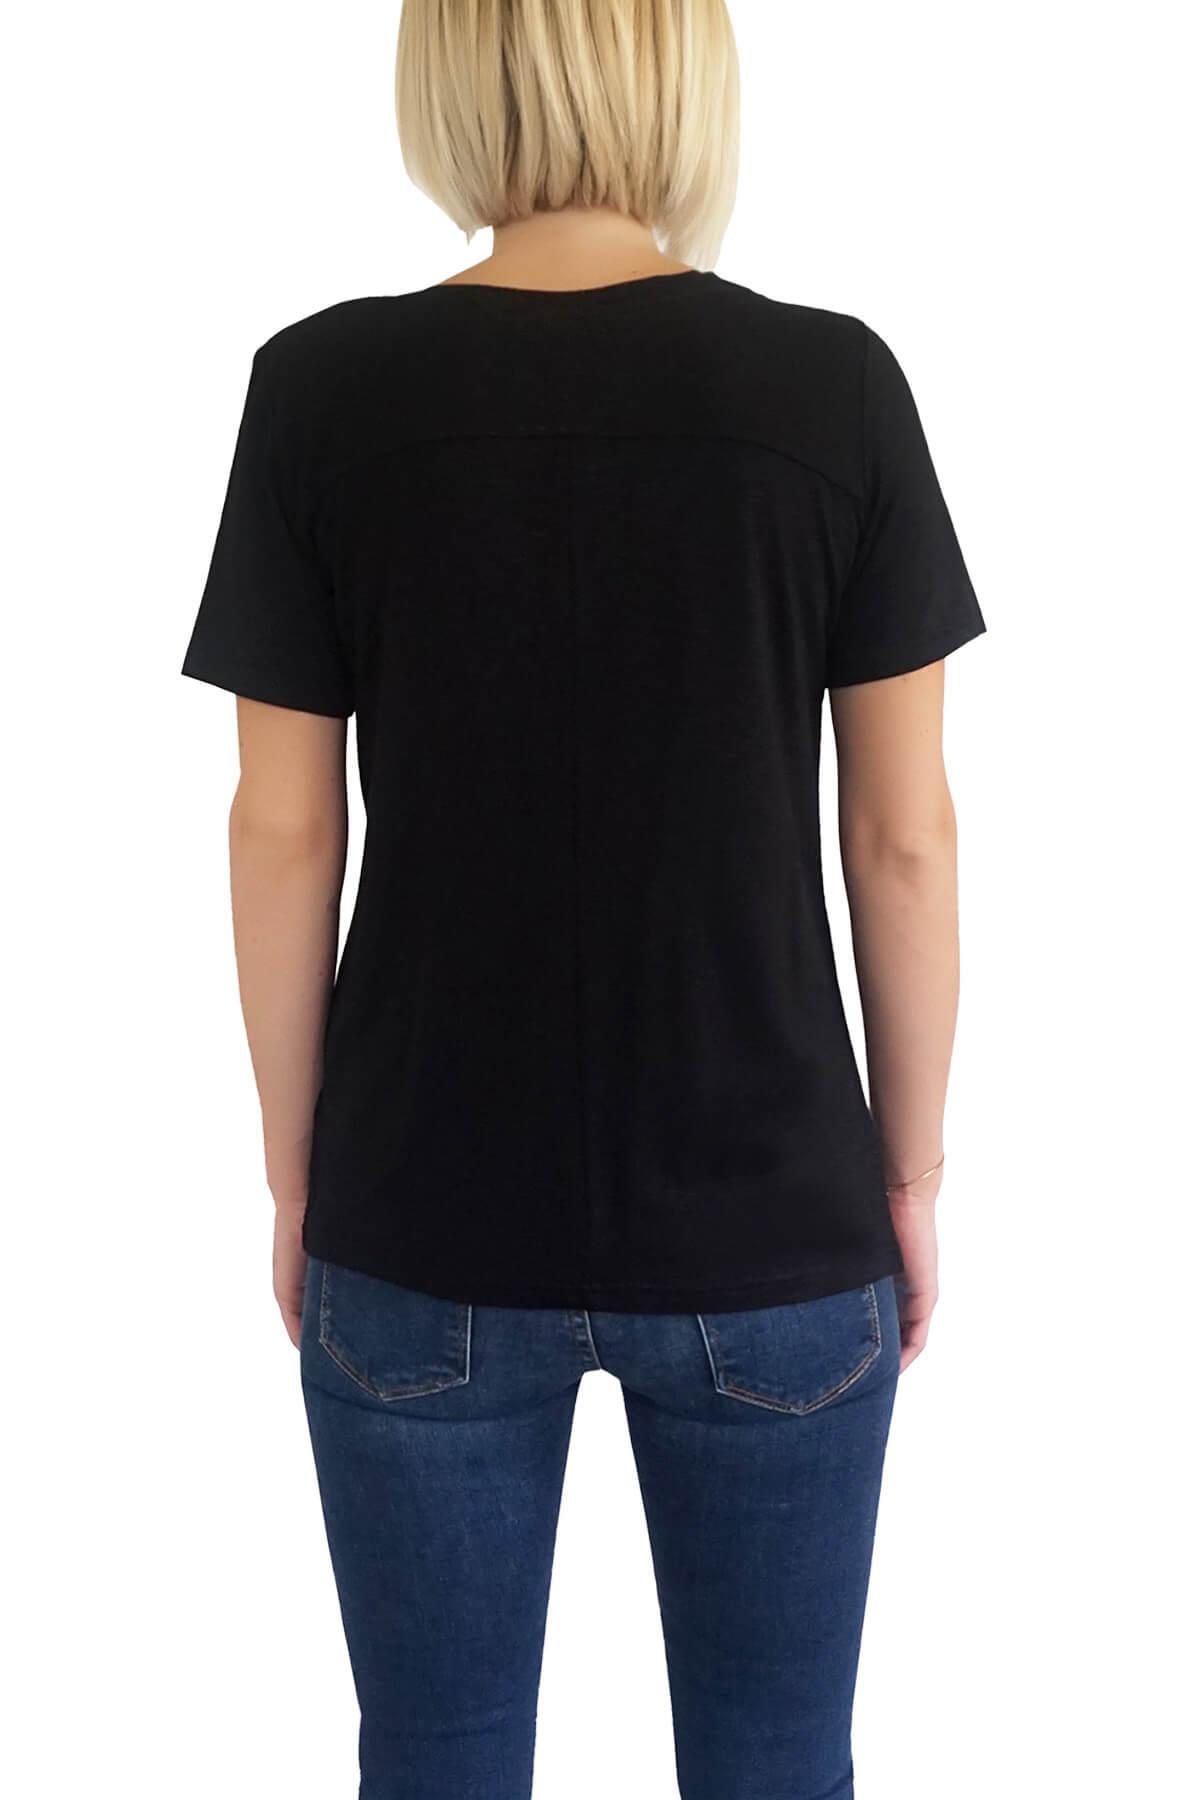 MOF Kadın Siyah T-Shirt VYCT-S 2